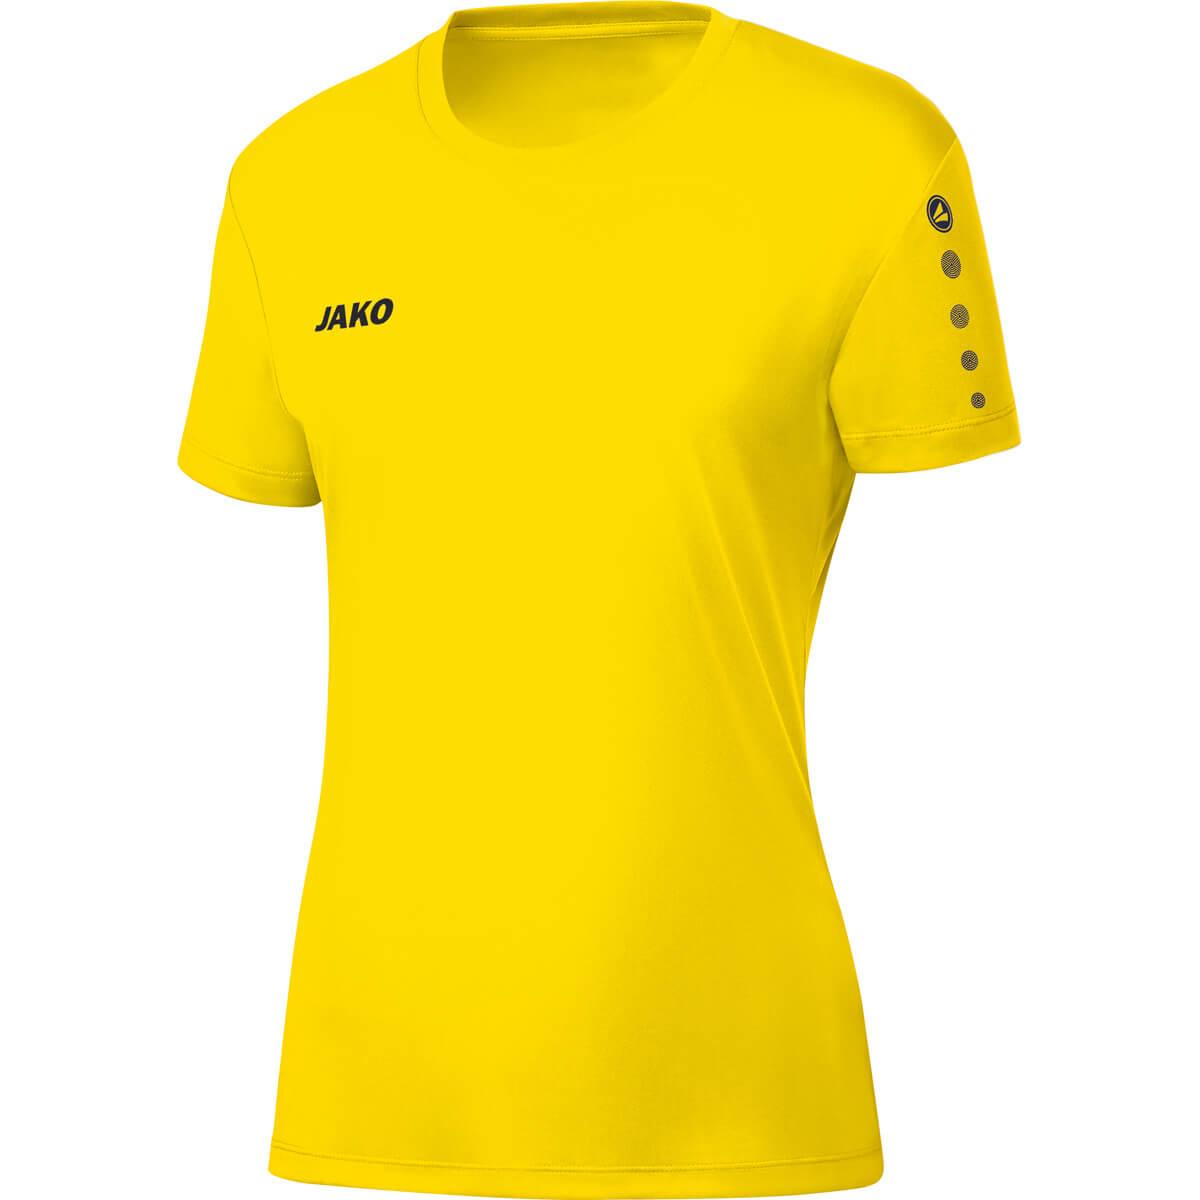 Trikot Team KA Damen - Frauen | Jako 4233D